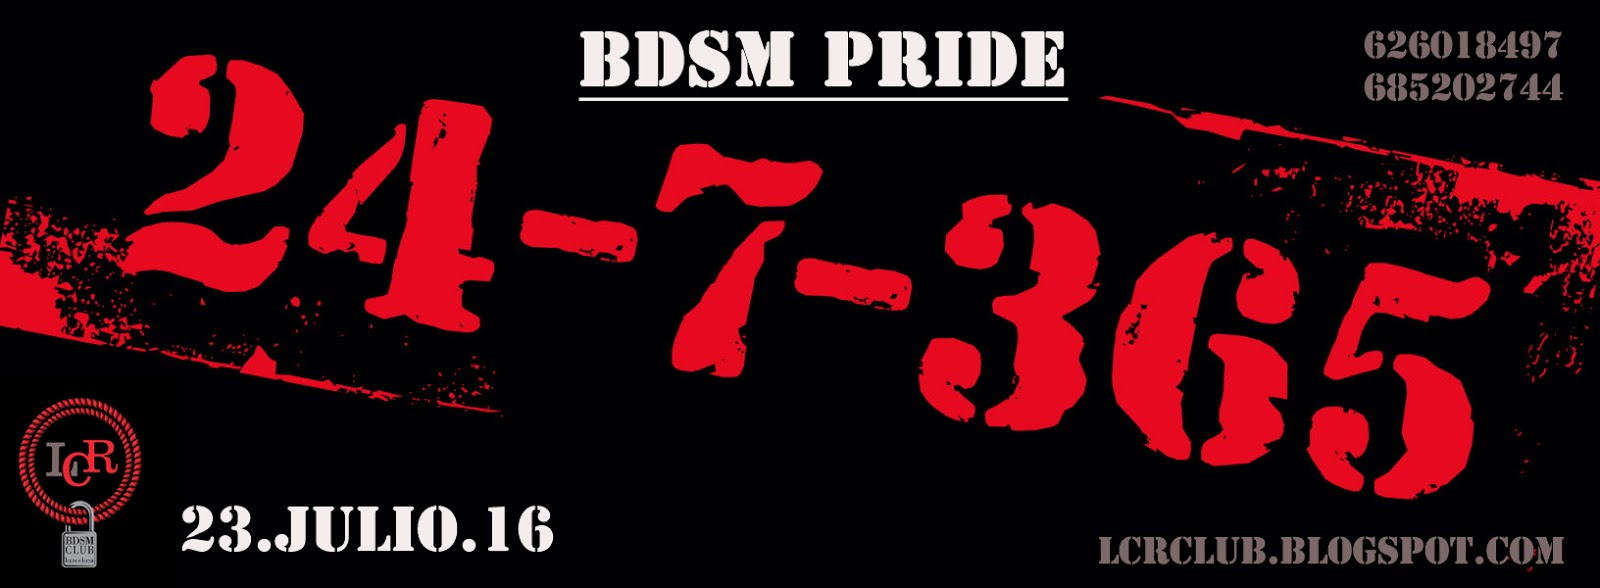 Fiesta BDSM Pride 24/7 en LCR Club (Barcelona)